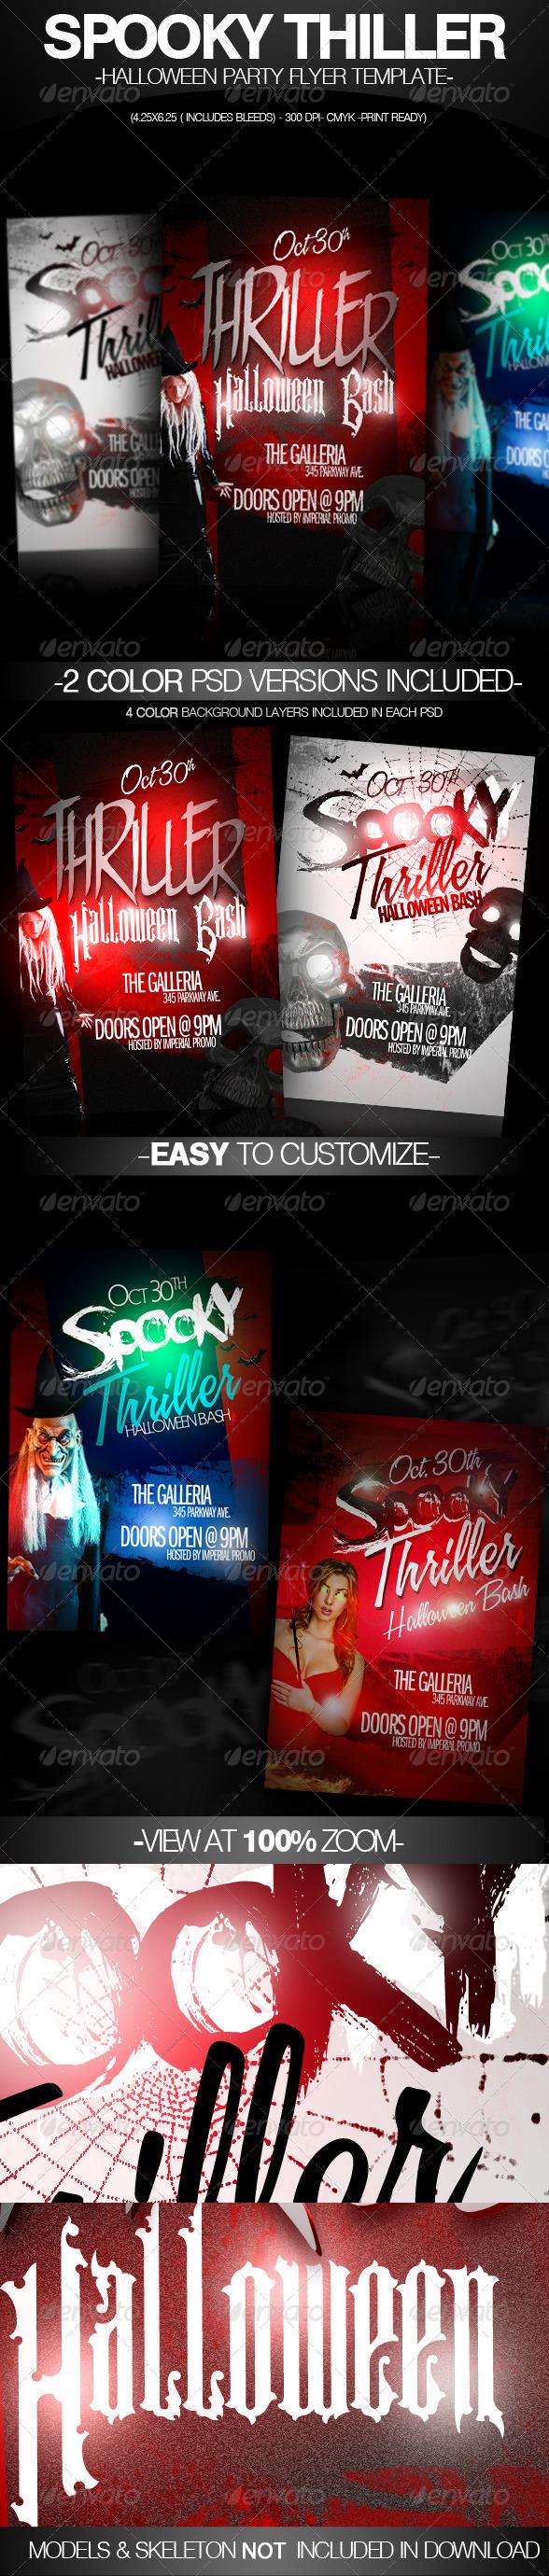 Spooky Thriller Halloween Flyer Template - Clubs & Parties Events